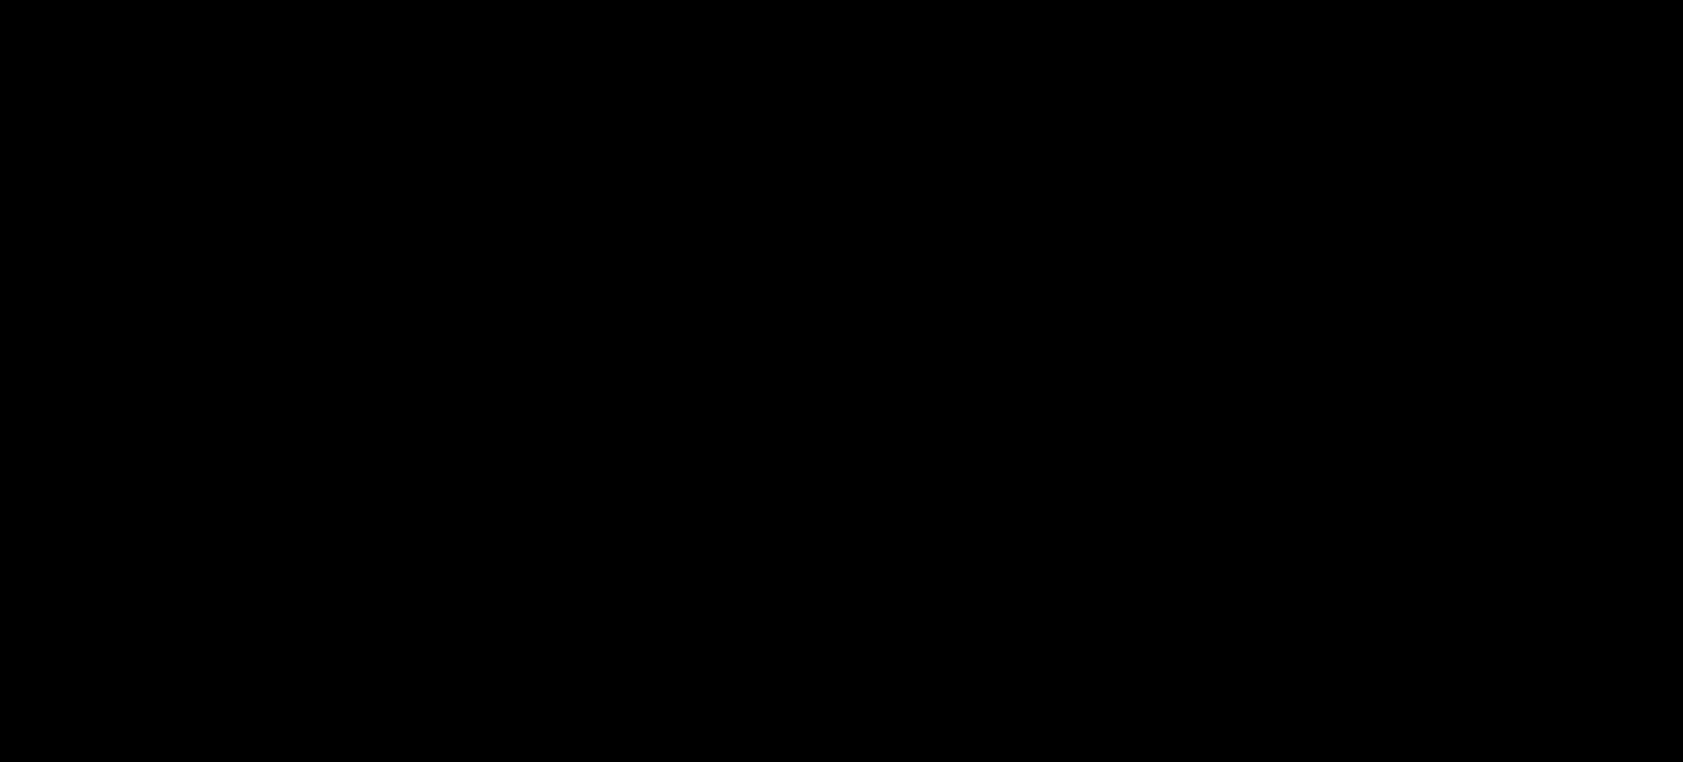 Methotrexate α-Methyl Ester